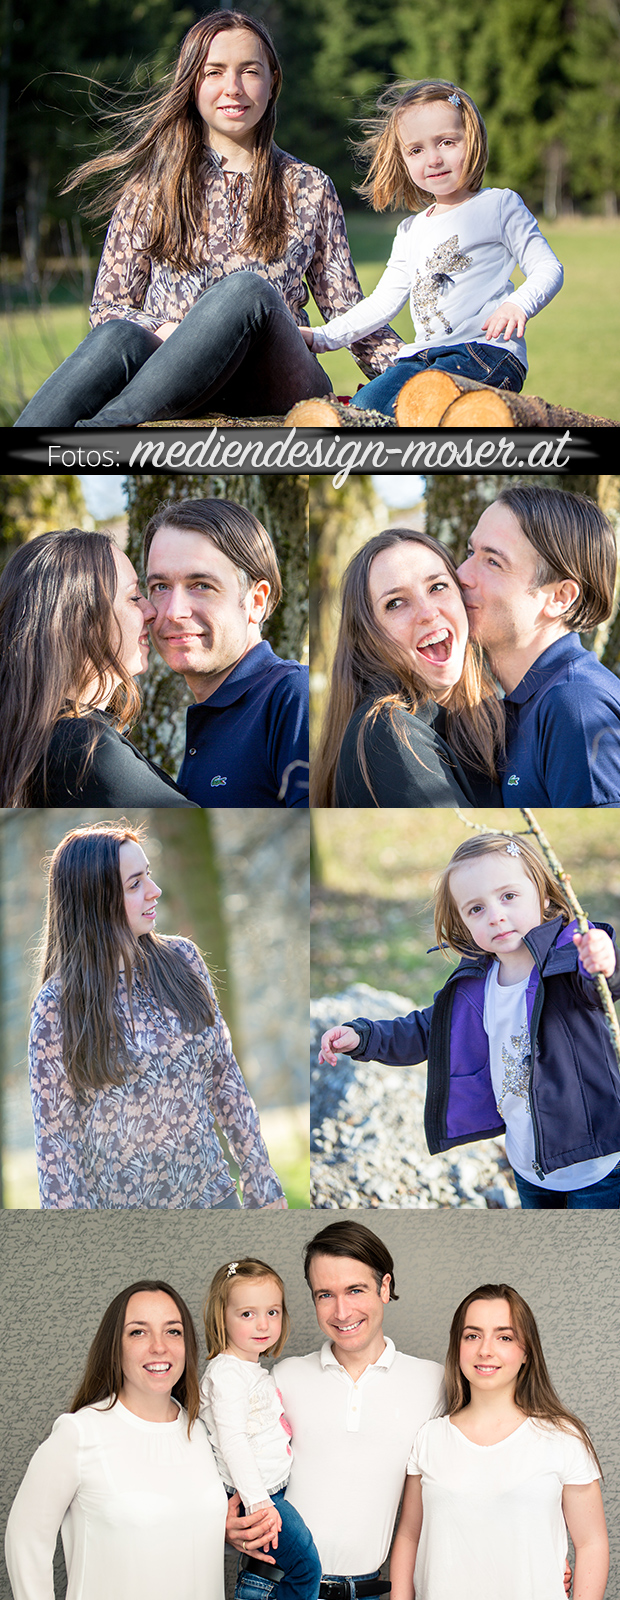 fotoserie-familienfotos-leonhard